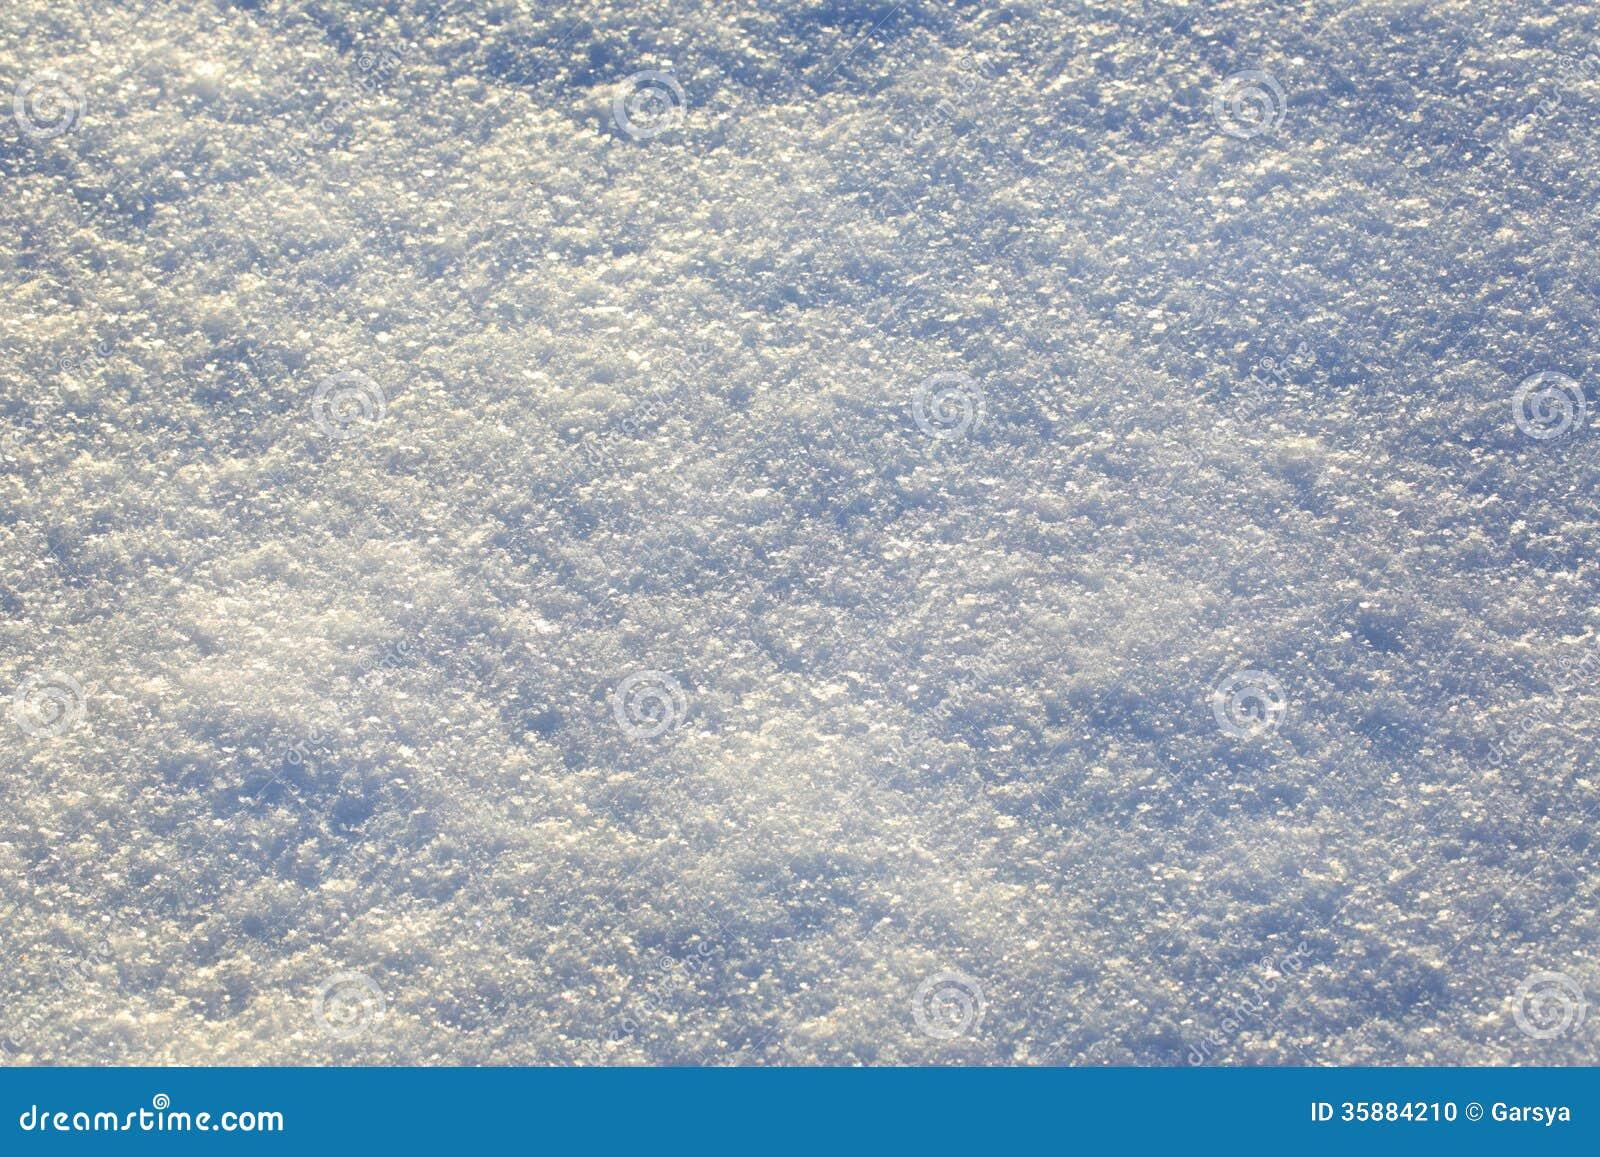 snow background stock photo image 35884210